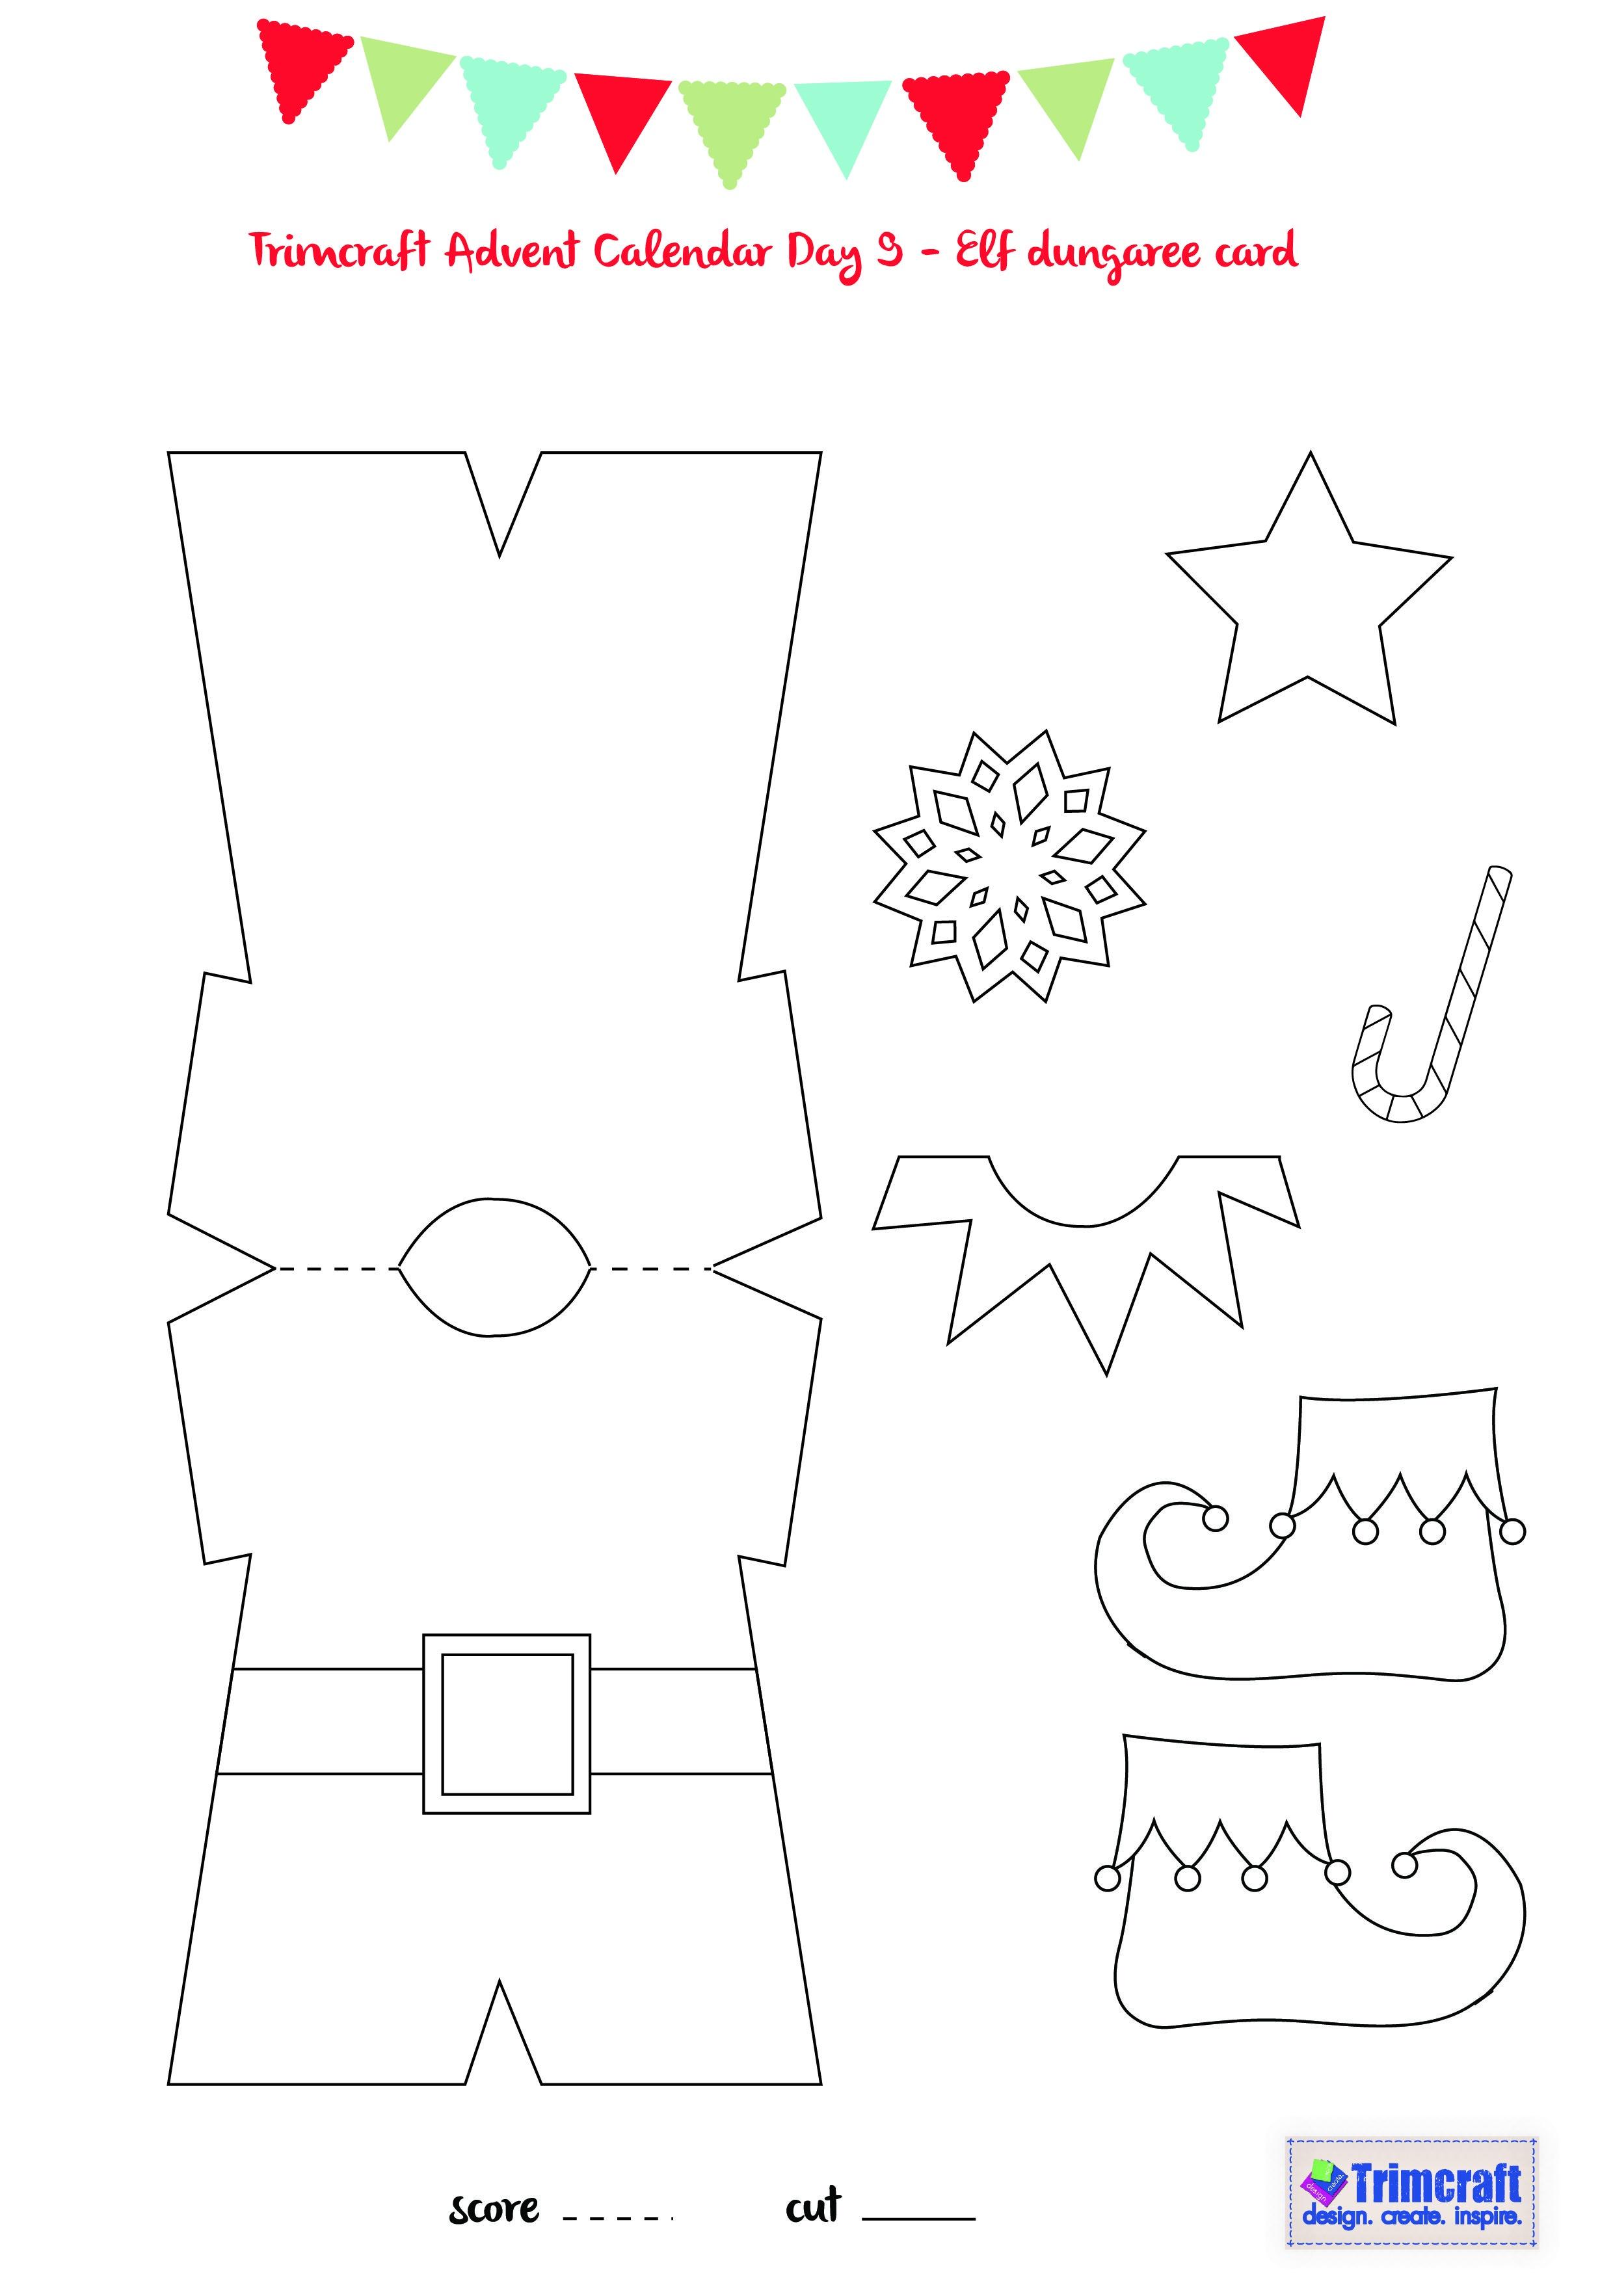 Trimcraft Advent Calendar Day 9 - Elf Card Template   Winter - Free Printable Elf Pattern